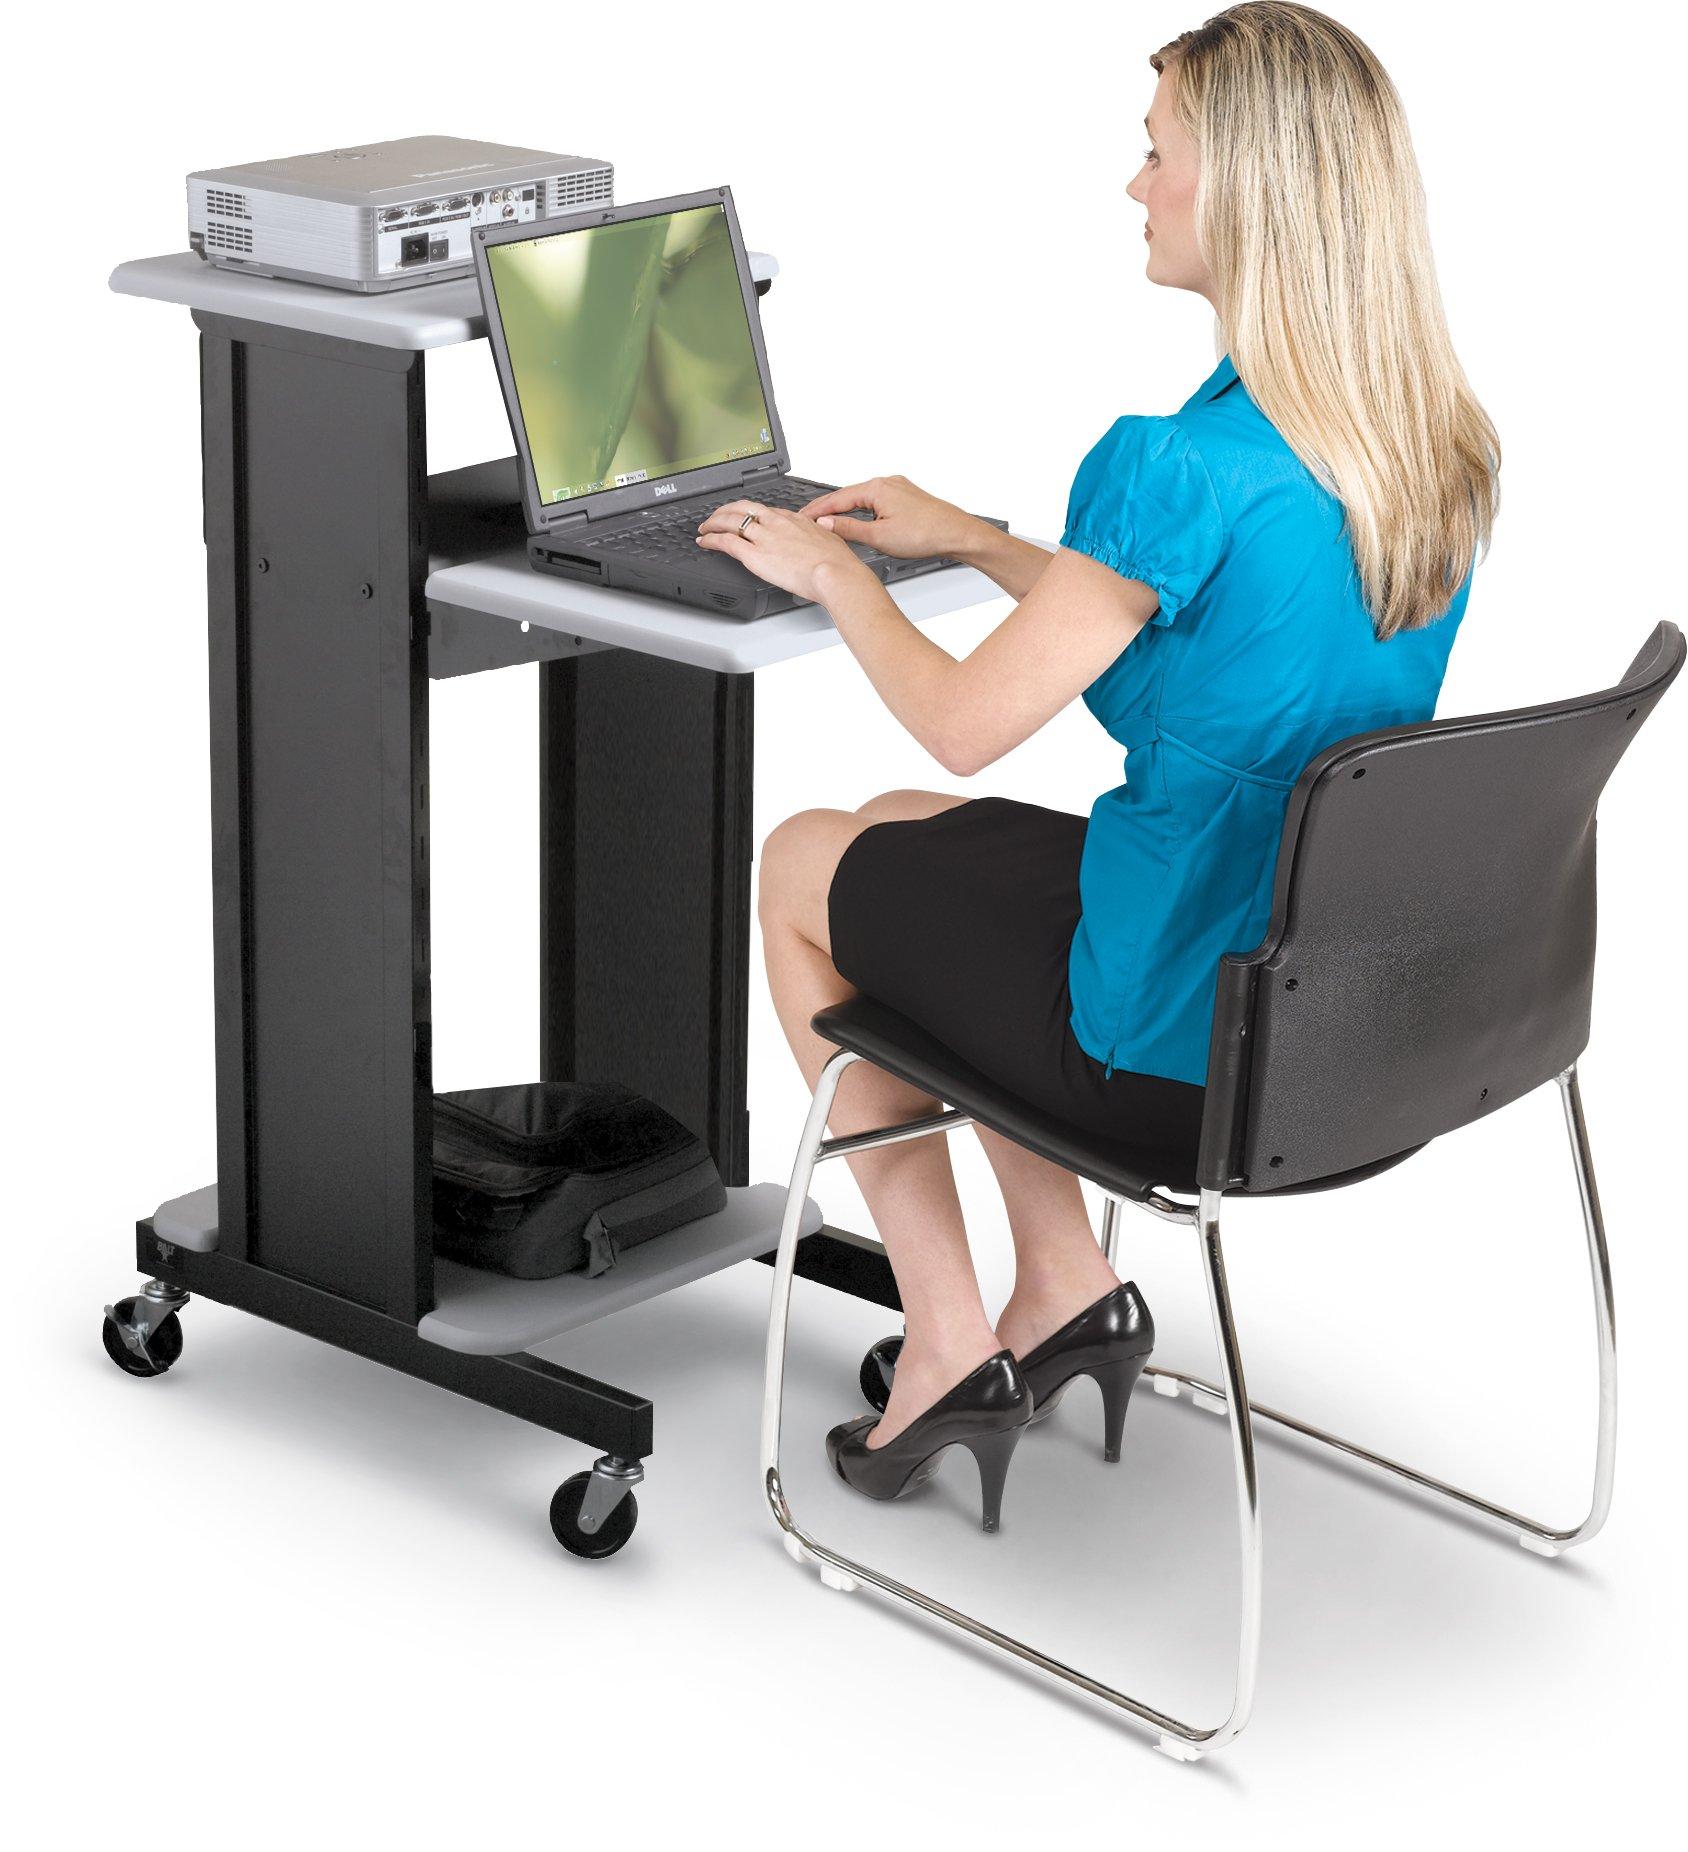 BALT 89759 Adjustable Presentation Cart, 18w x 30d x 40-1/4h, Black/Gray by Balt (Image #3)